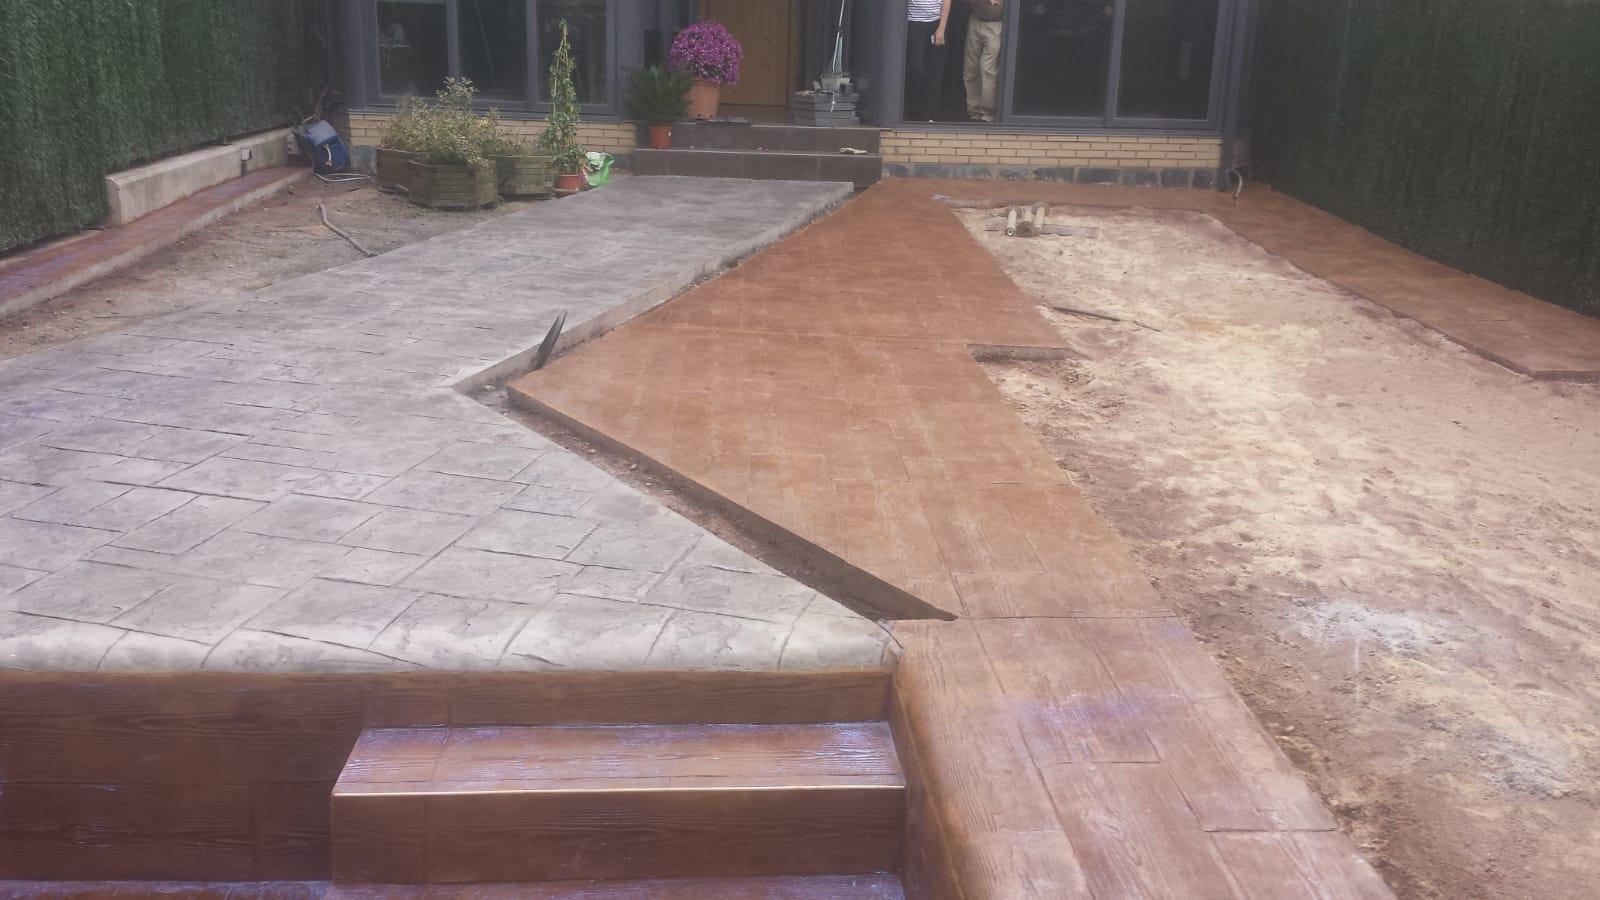 escalera de madera con pasillo de piedra